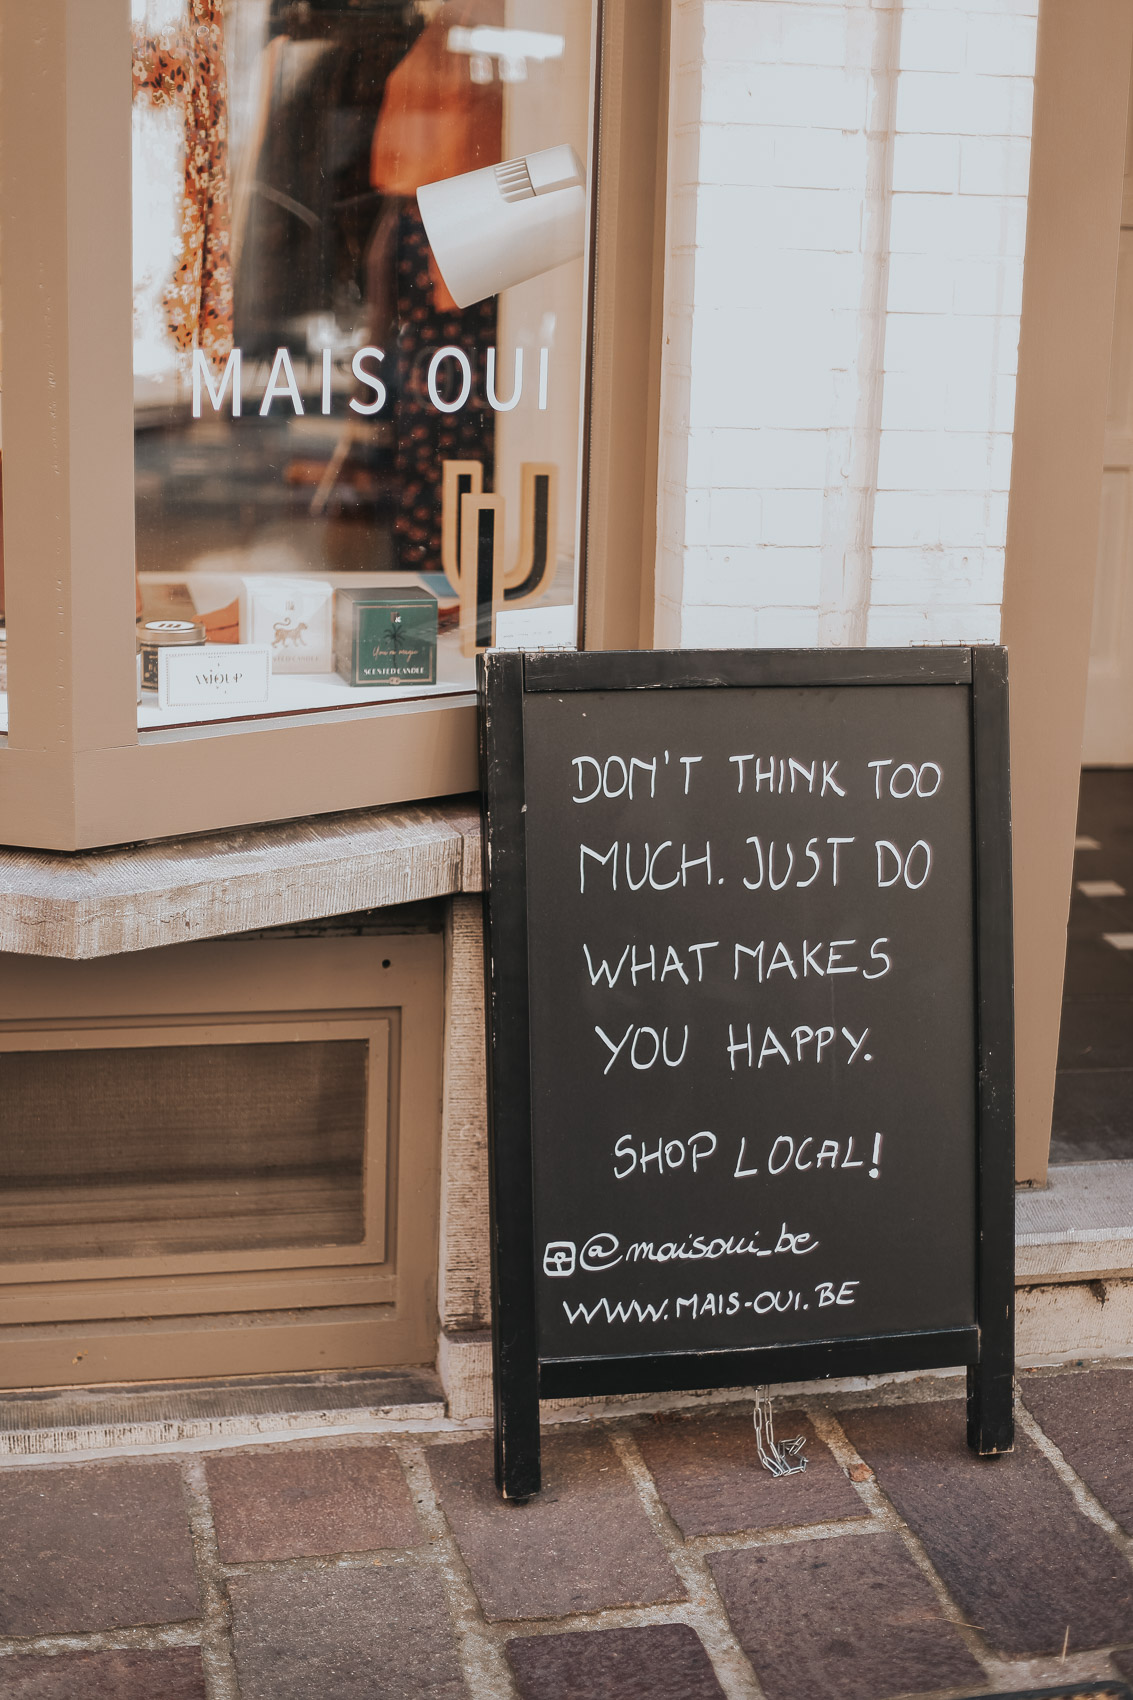 Mais Oui Clothing shop in Bruges